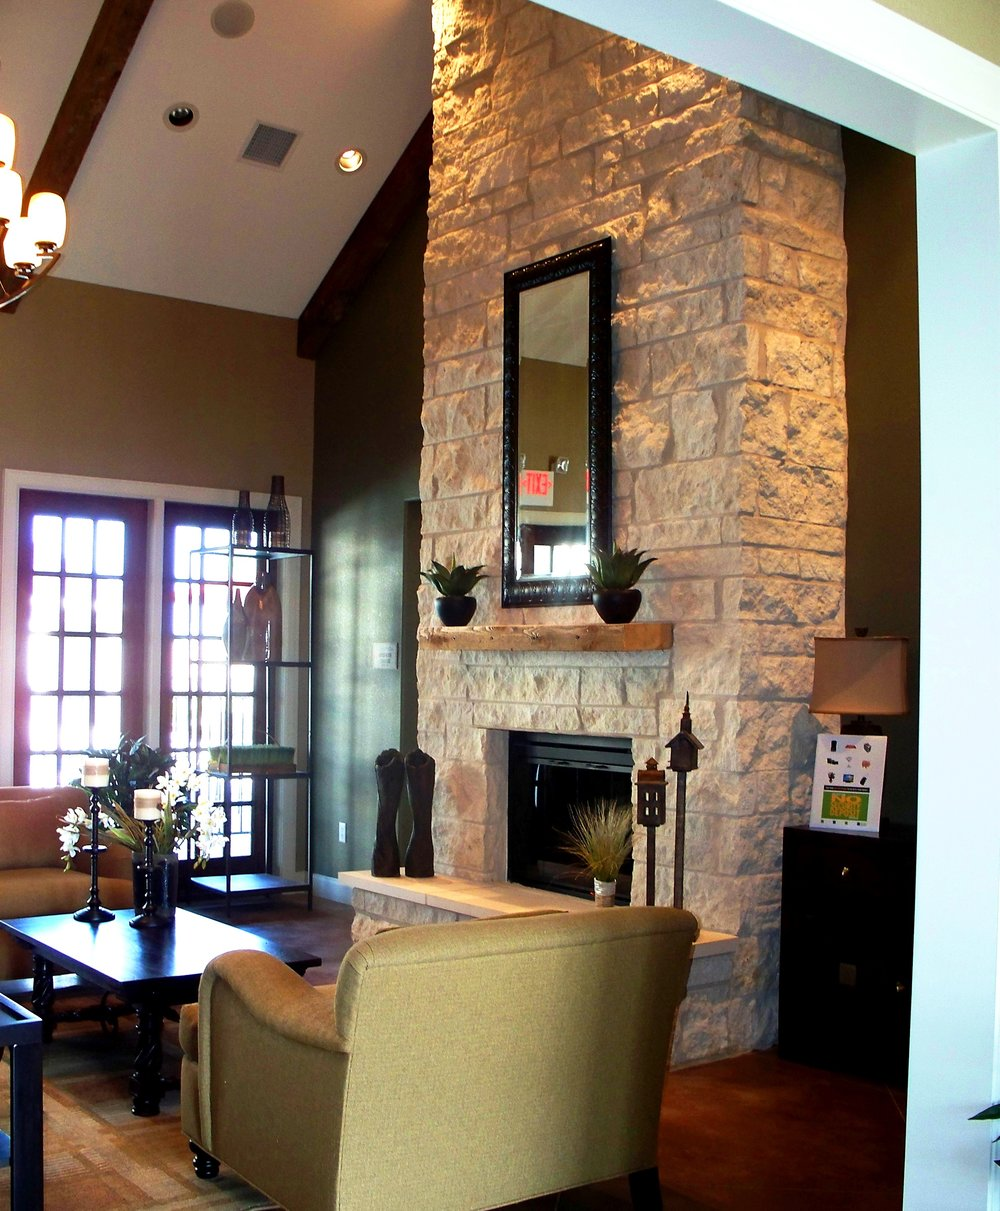 eaglebrook cub fireplace.JPG